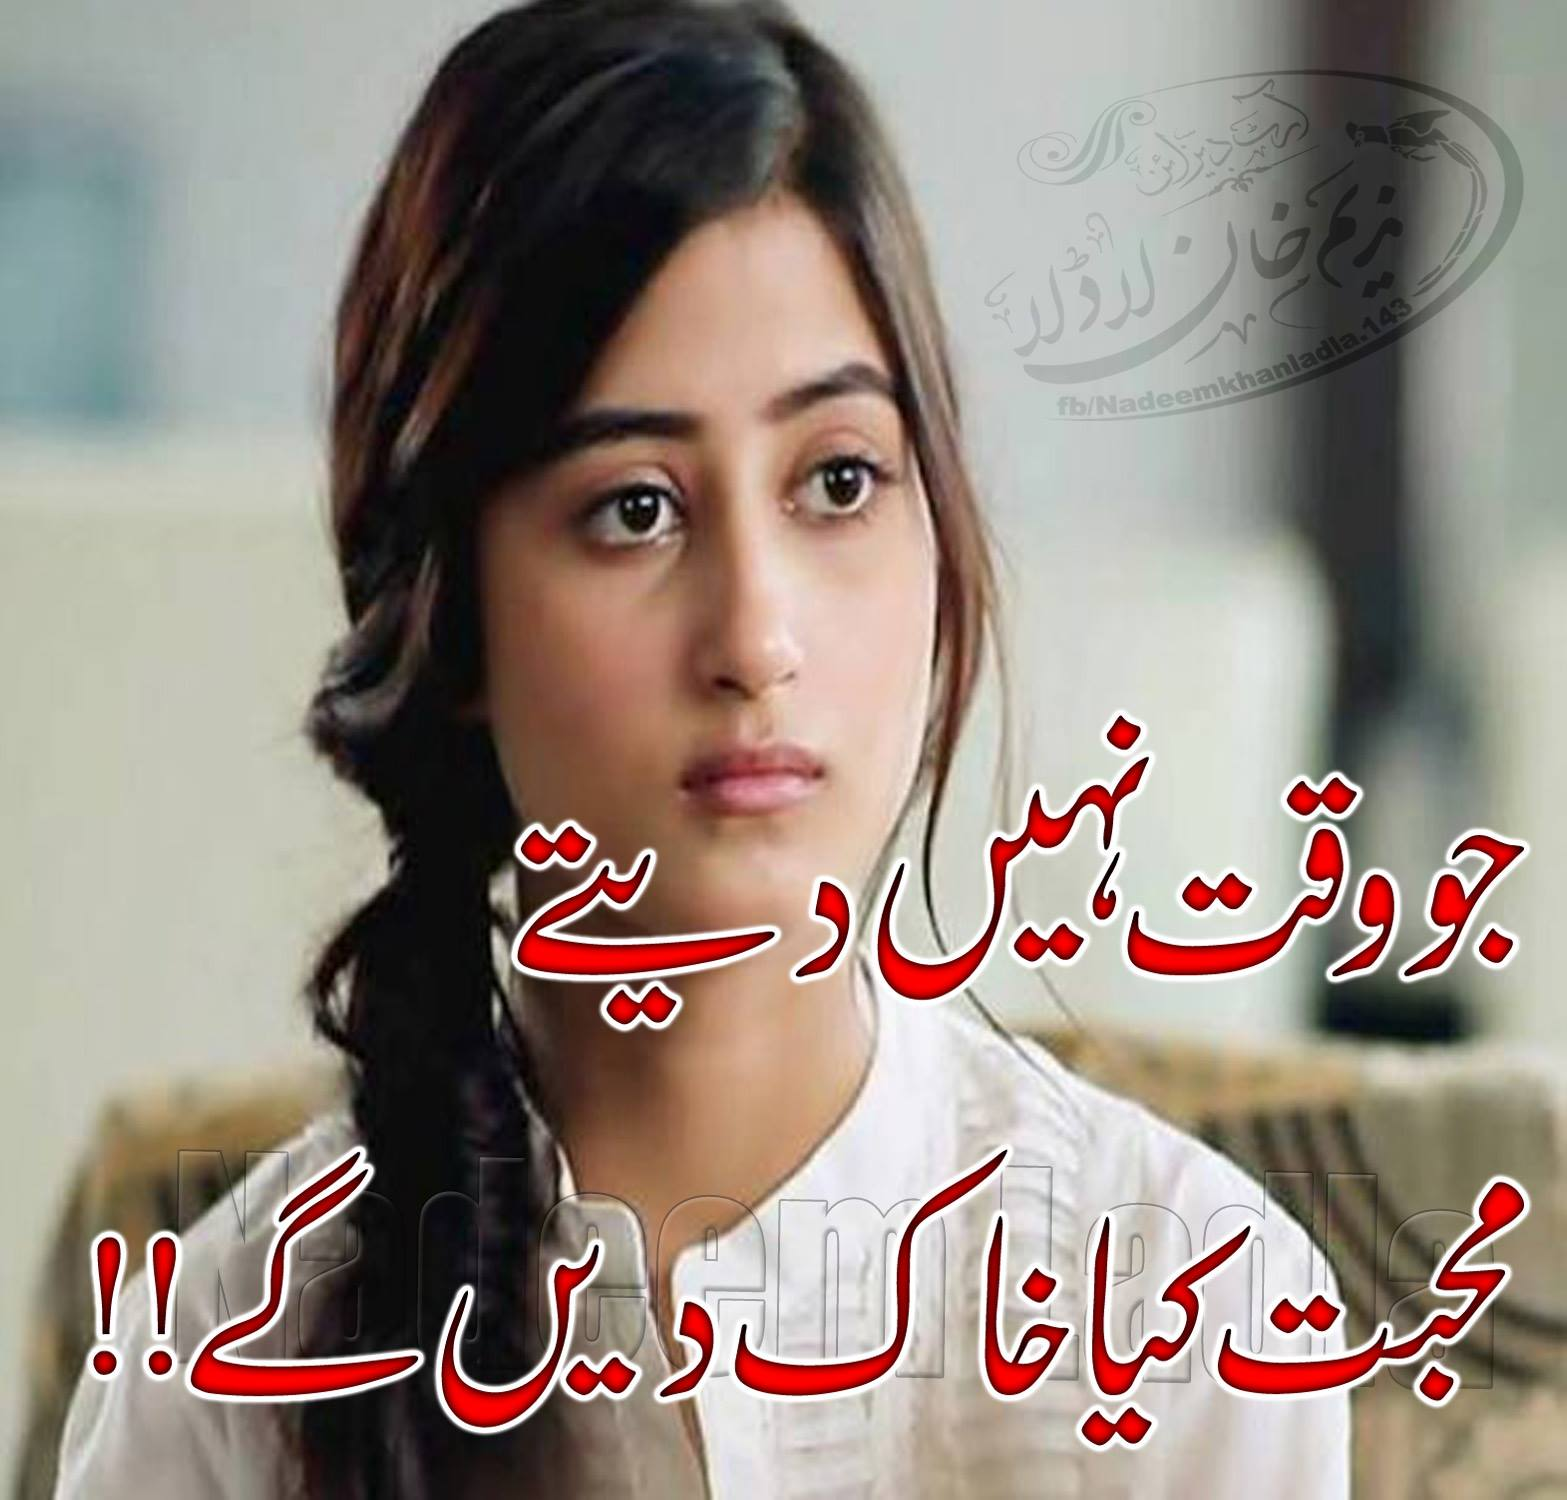 urdu poetry ~ Stylish DP Girls